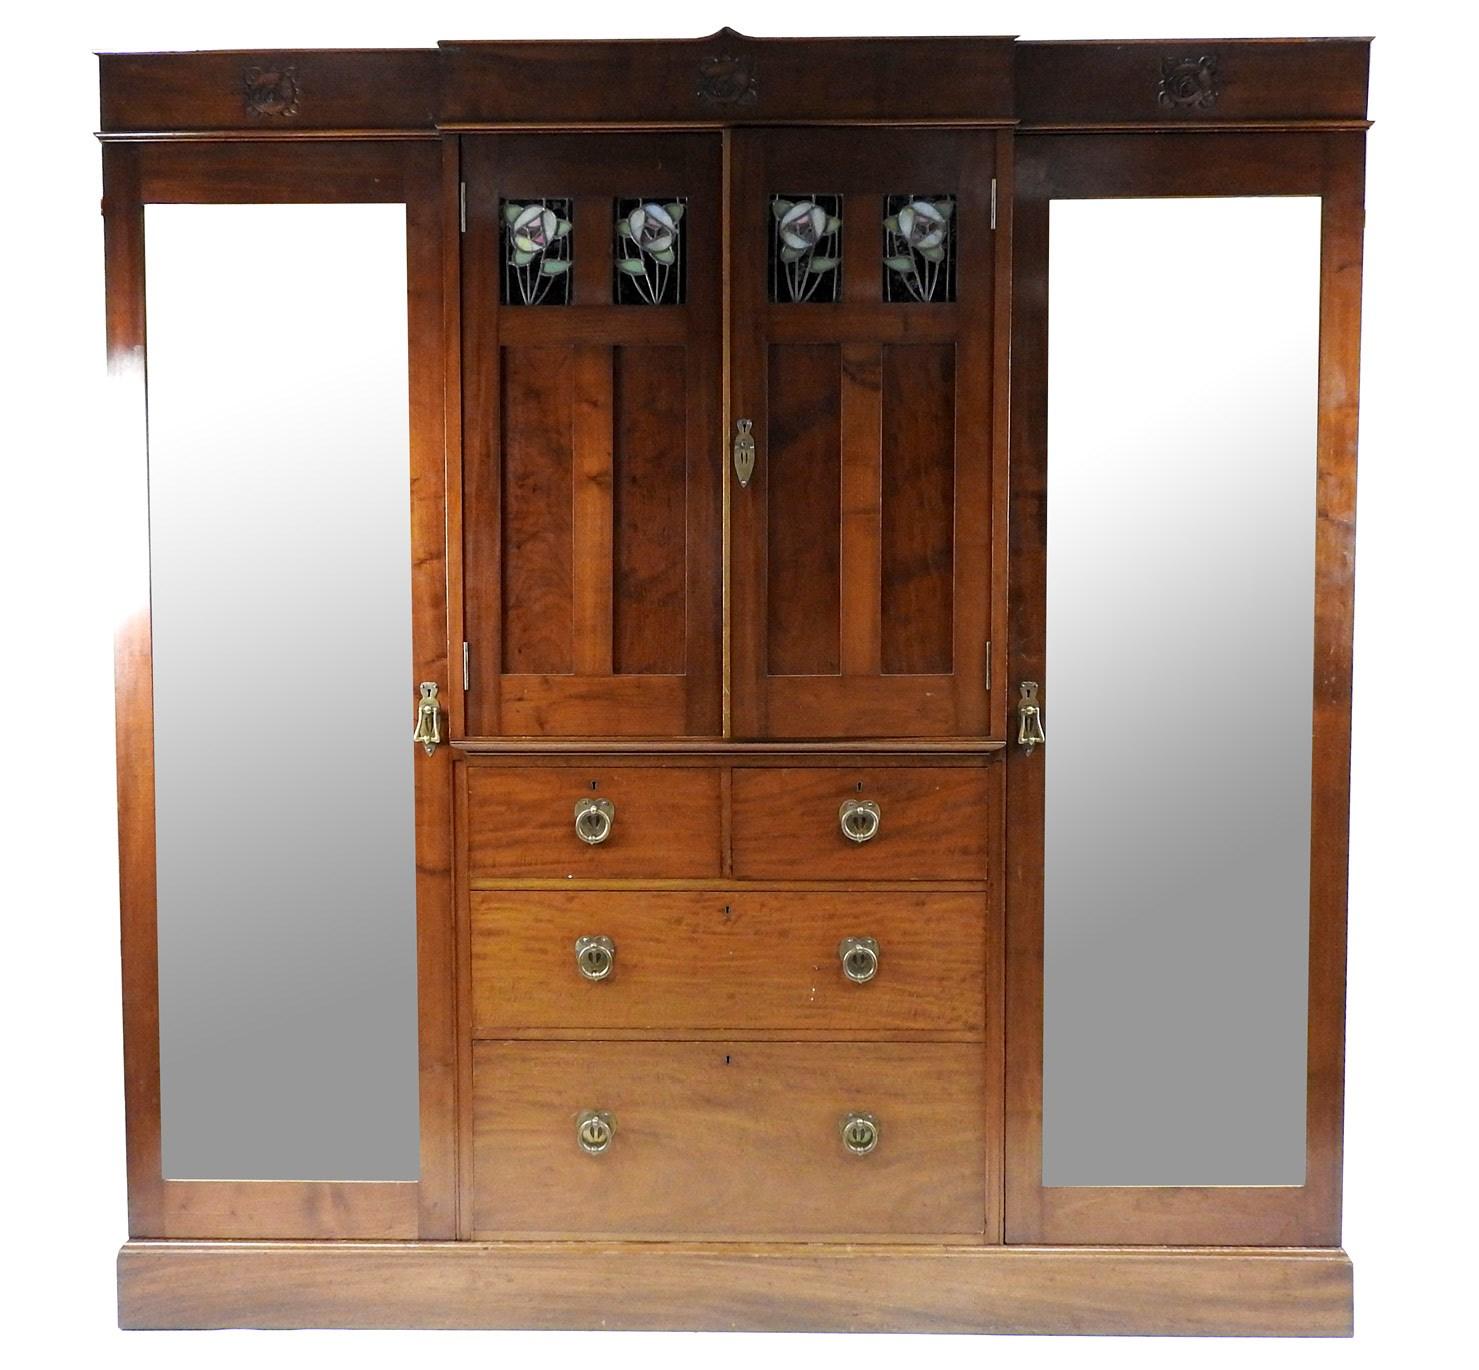 Lot 167, A Glasgow School Arts and Crafts mahogany bedroom suite